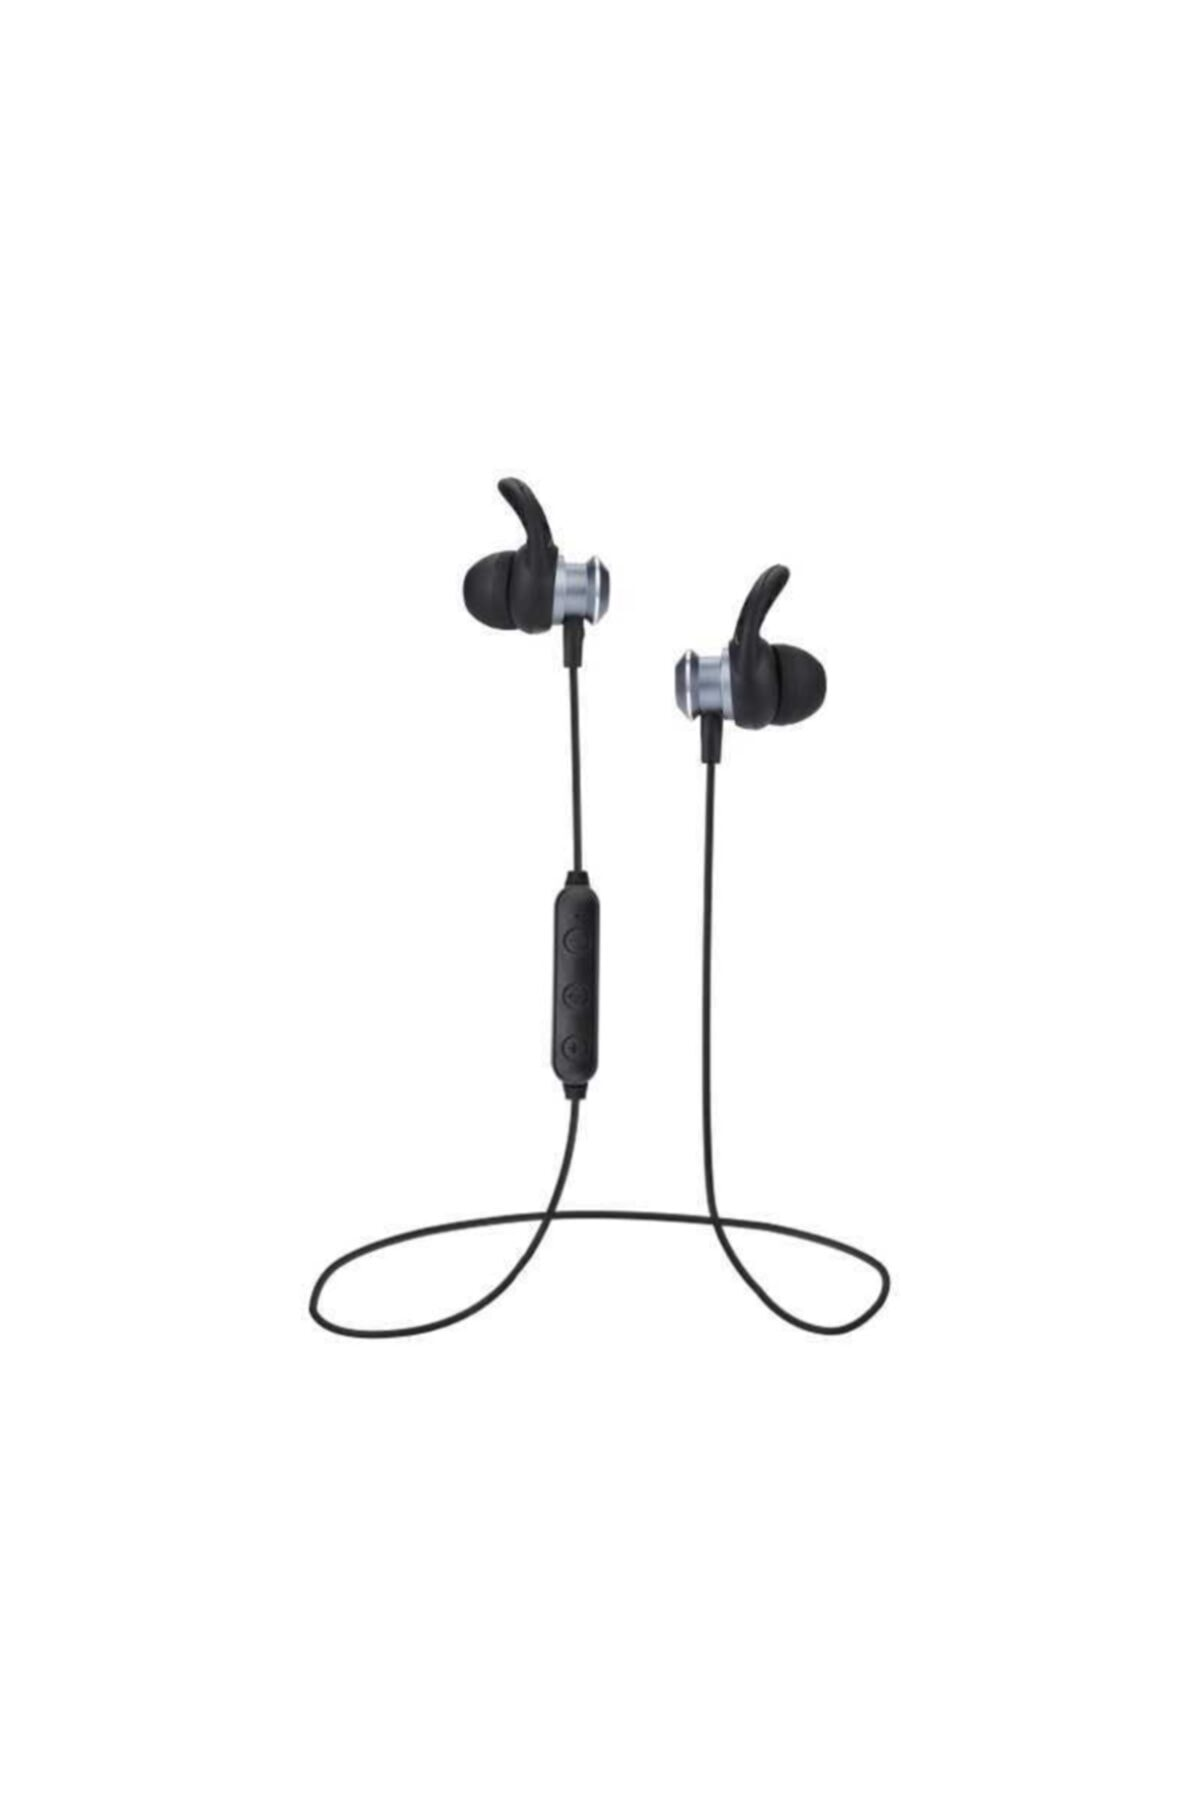 zore Gri Bt-zr1 Bluetooth Kulaklık 1